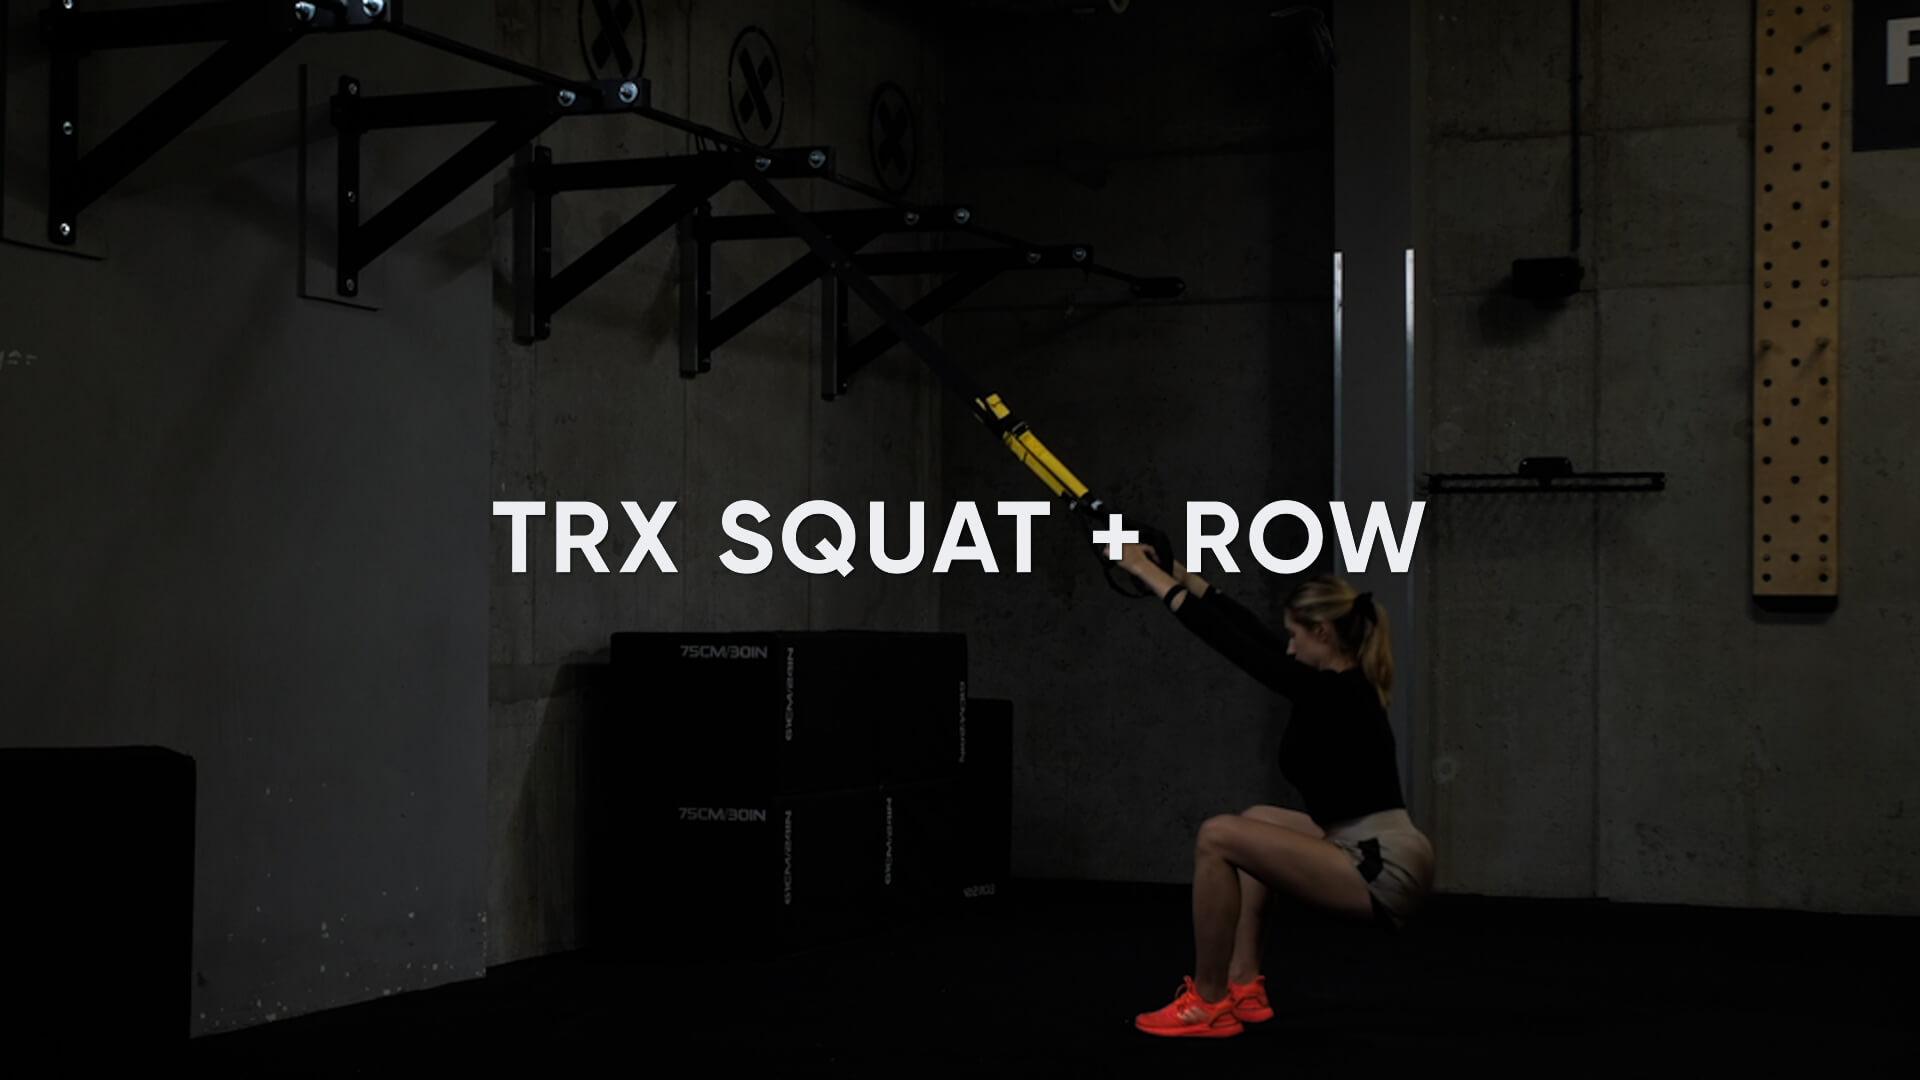 TRX Squat + Row